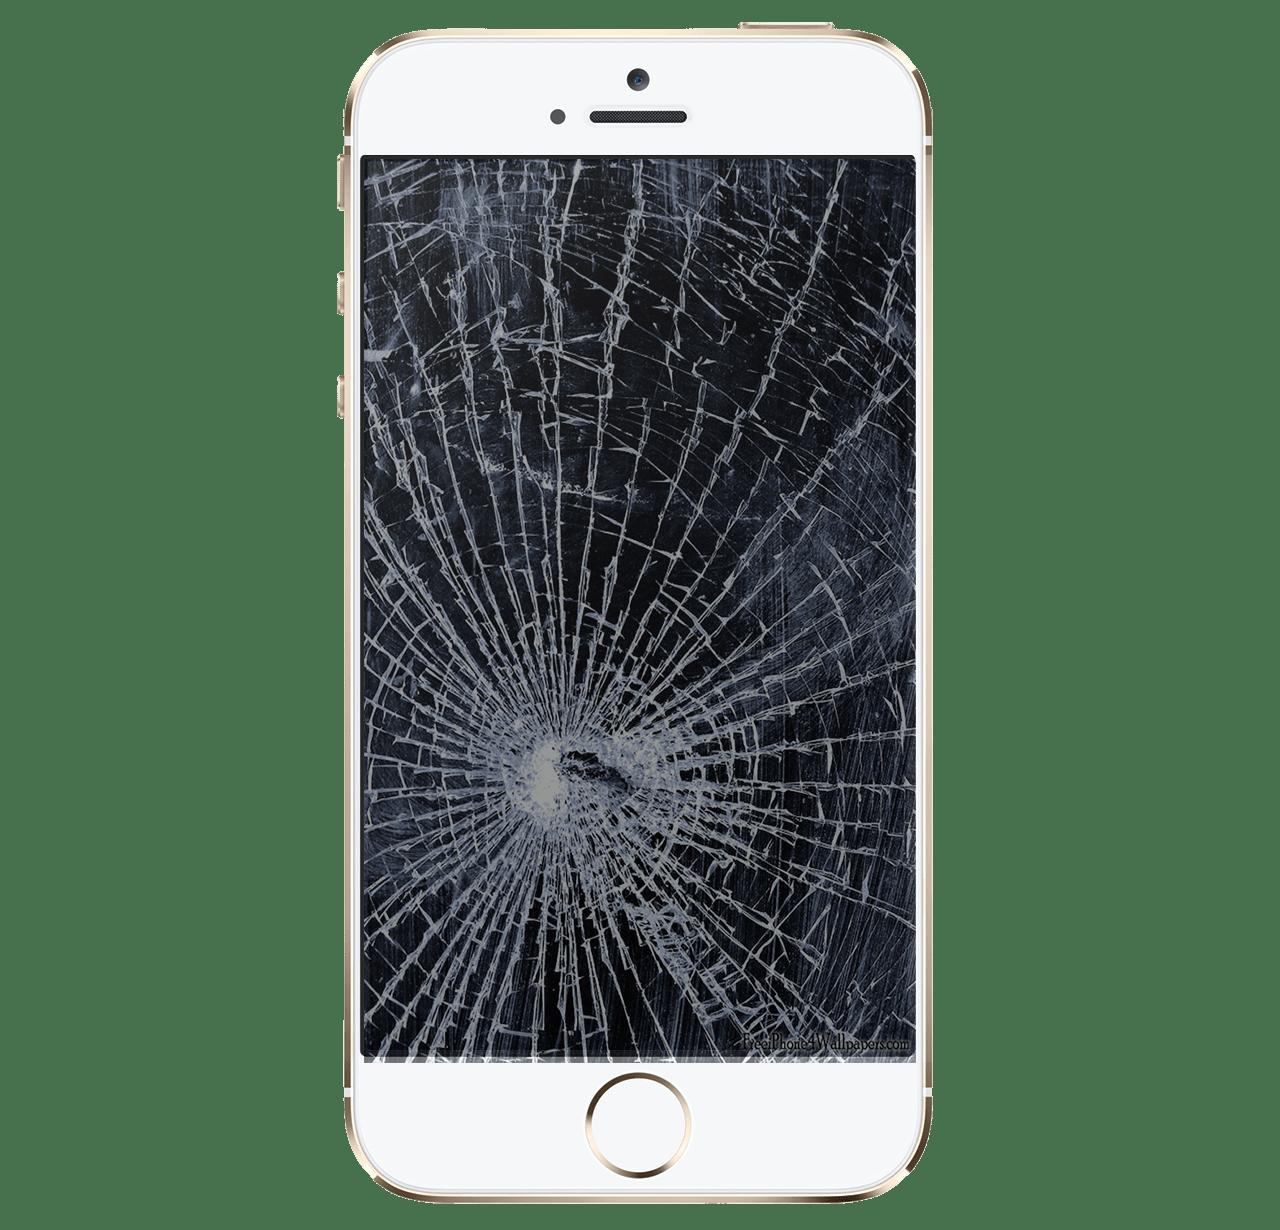 Iphone clipart iphone screen 7 Template transparent Screen Iphone